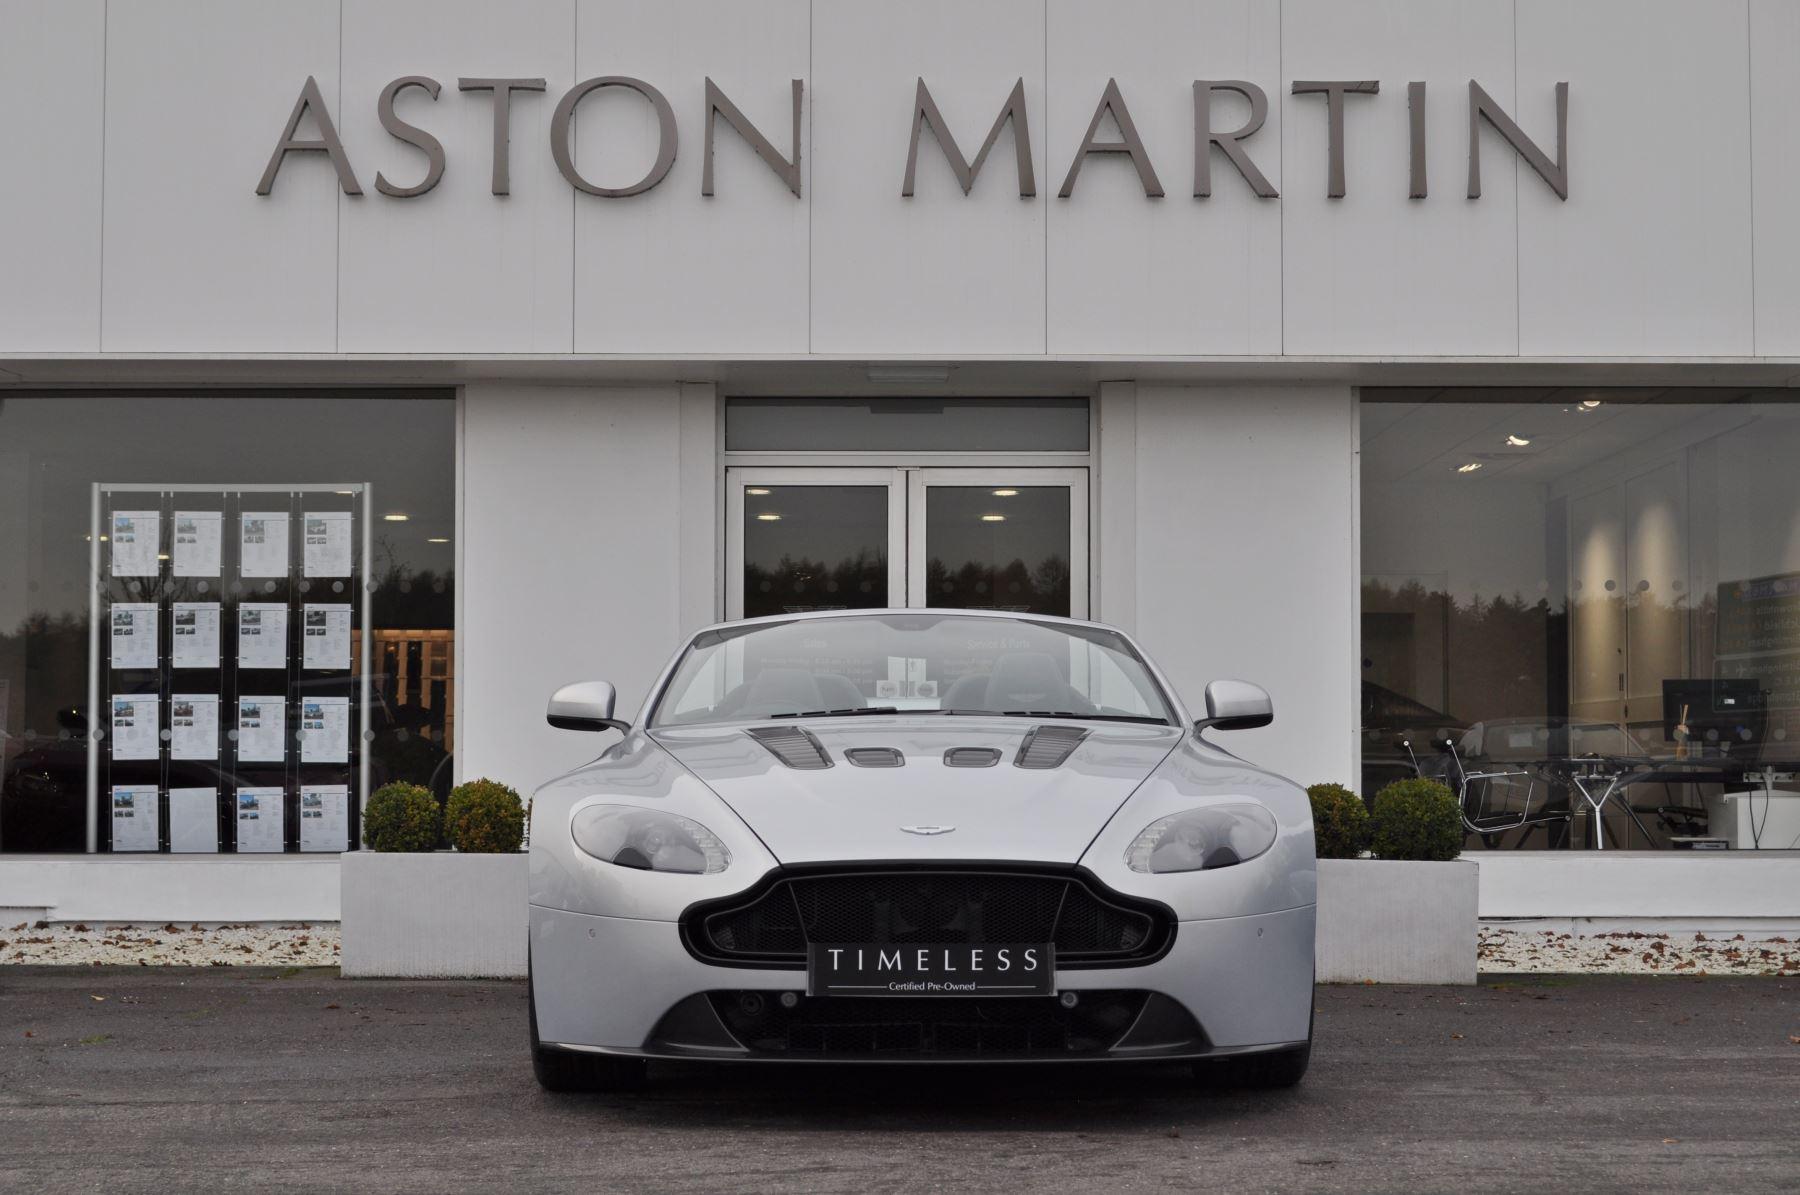 Aston Martin V12 Vantage S S 2dr Sportshift III image 2